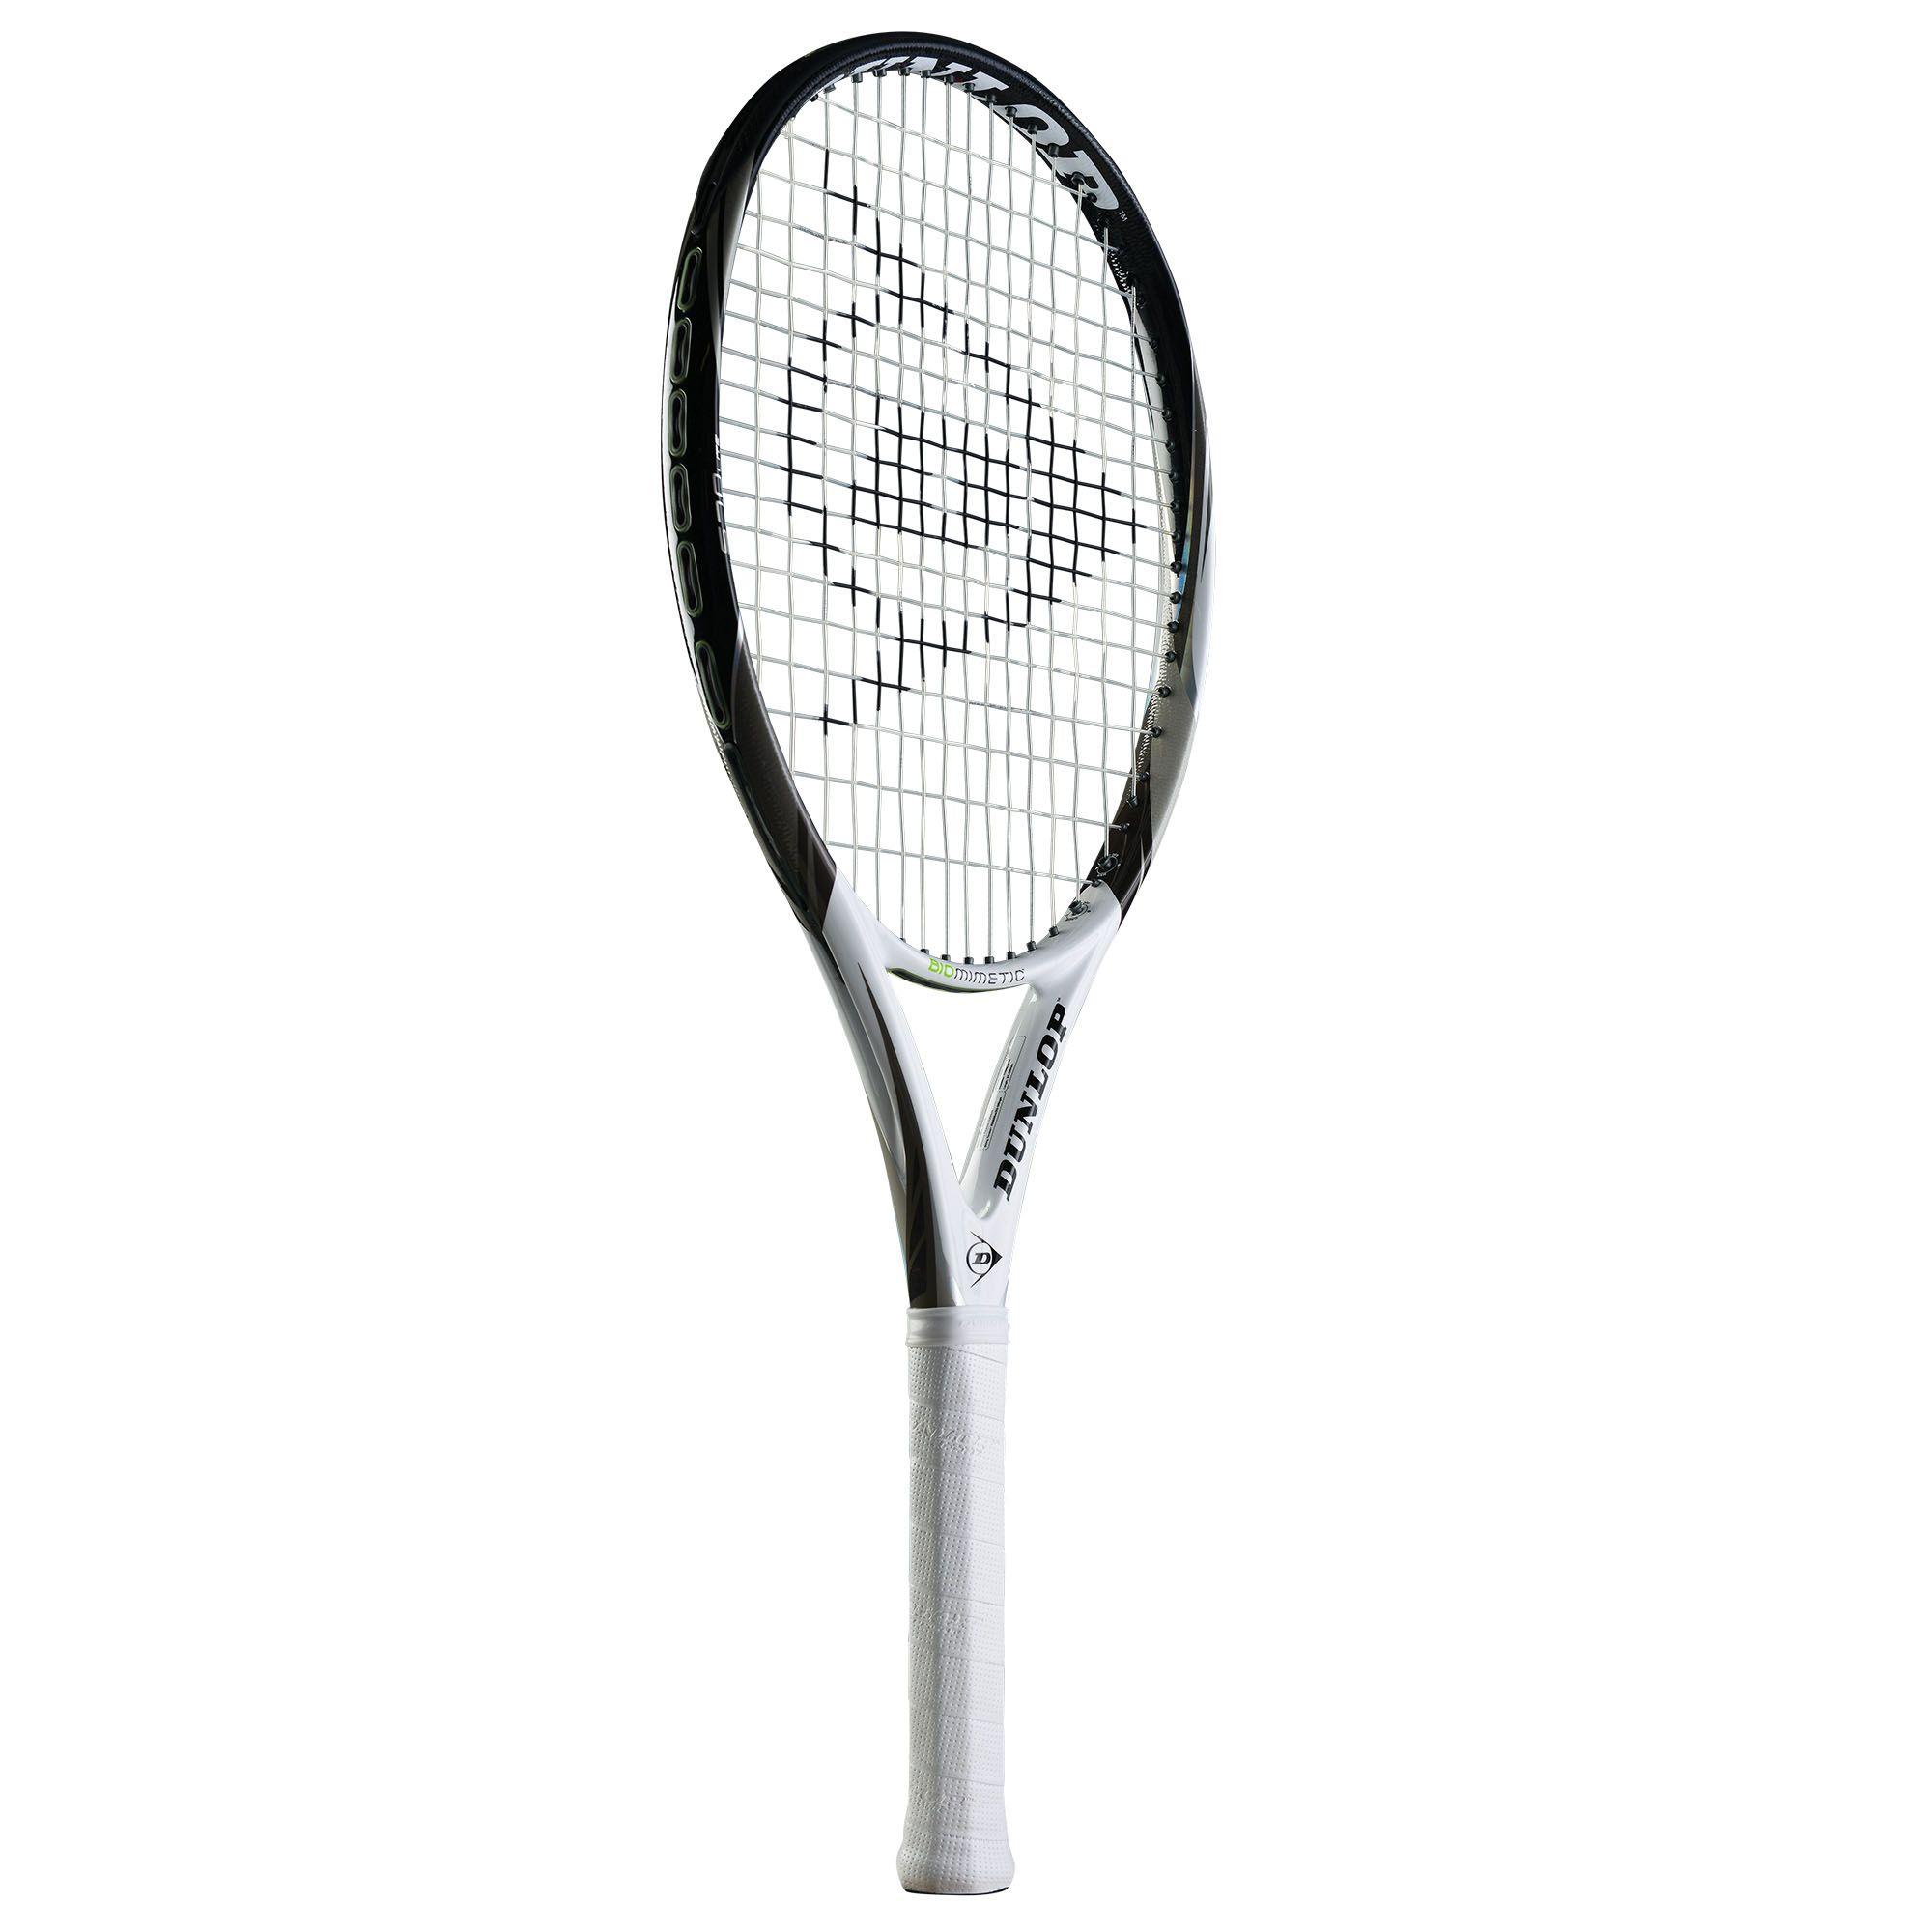 Dunlop Biomimetic S7 0 Lite Tennis Racket Sweatband Com